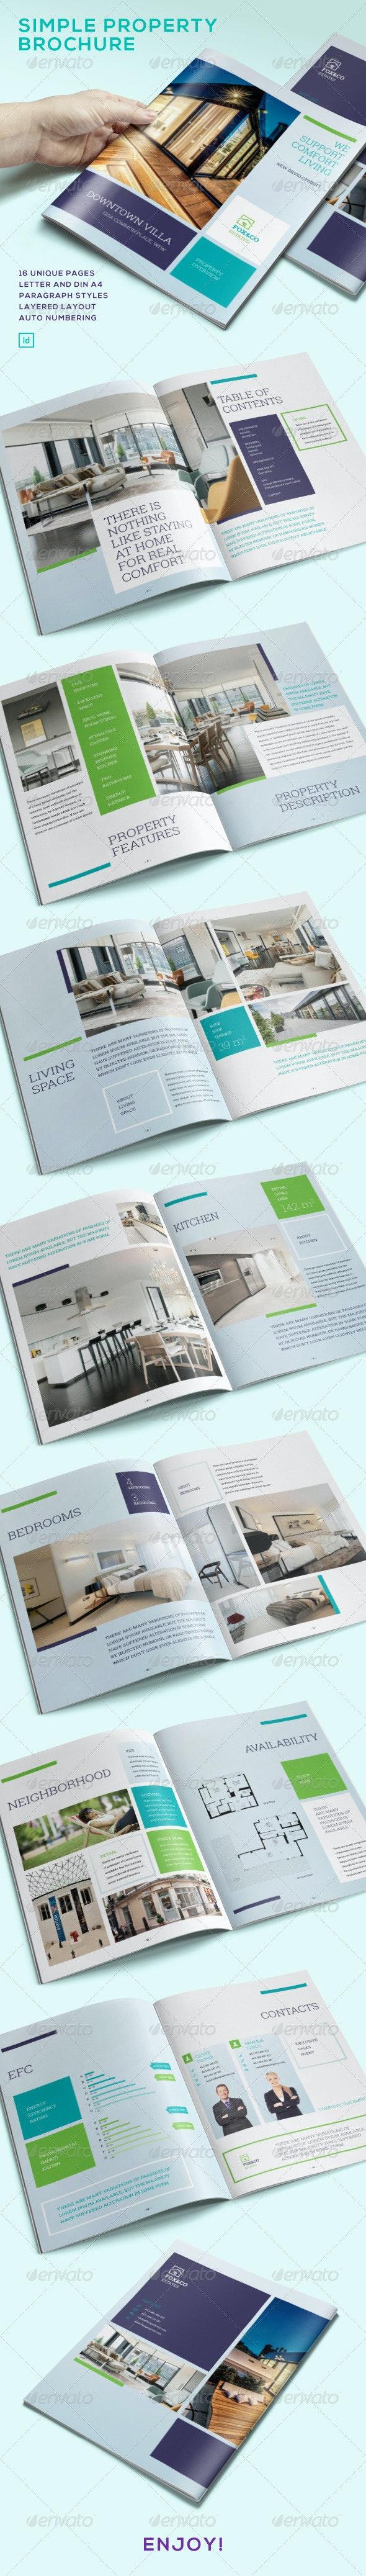 Simple Property Bruchure - Brochures Print Templates